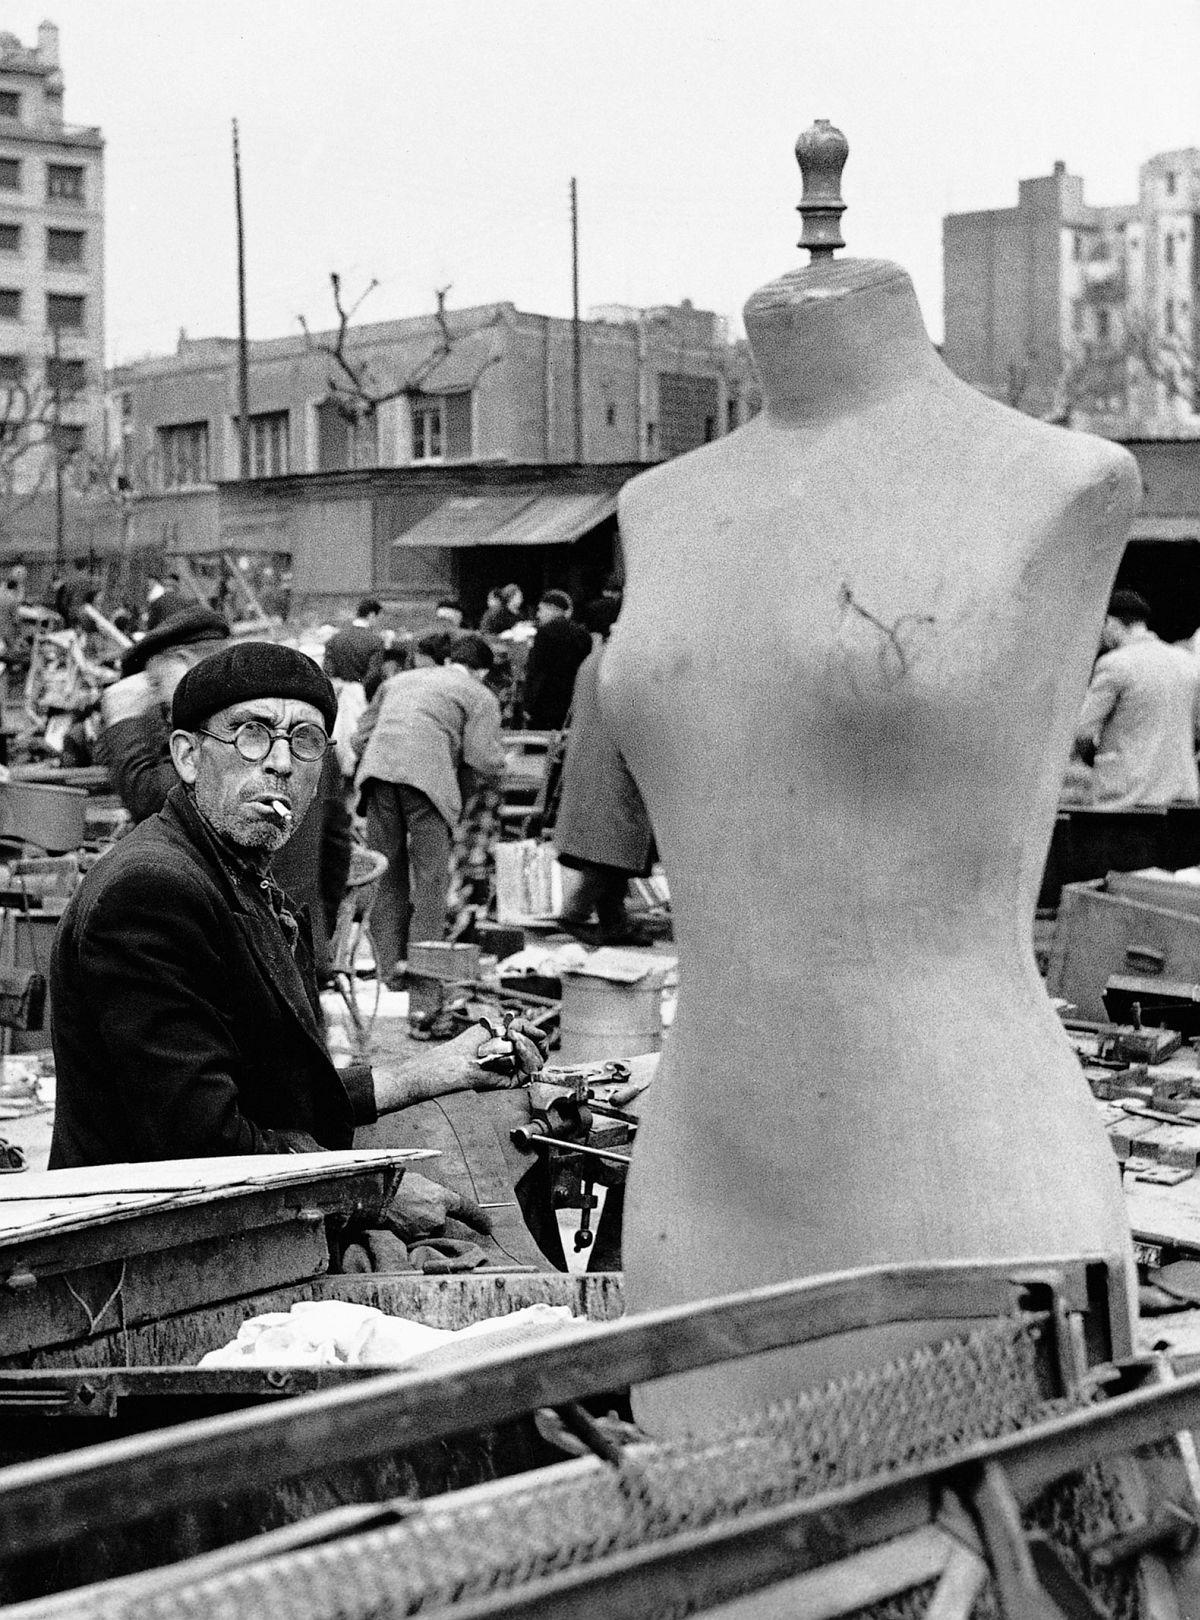 Los Encantes. Barcelona, 1957. By Xavier Miserachs. Photograph © Arena and Mar Miserachs, courtesy via La Fabrica